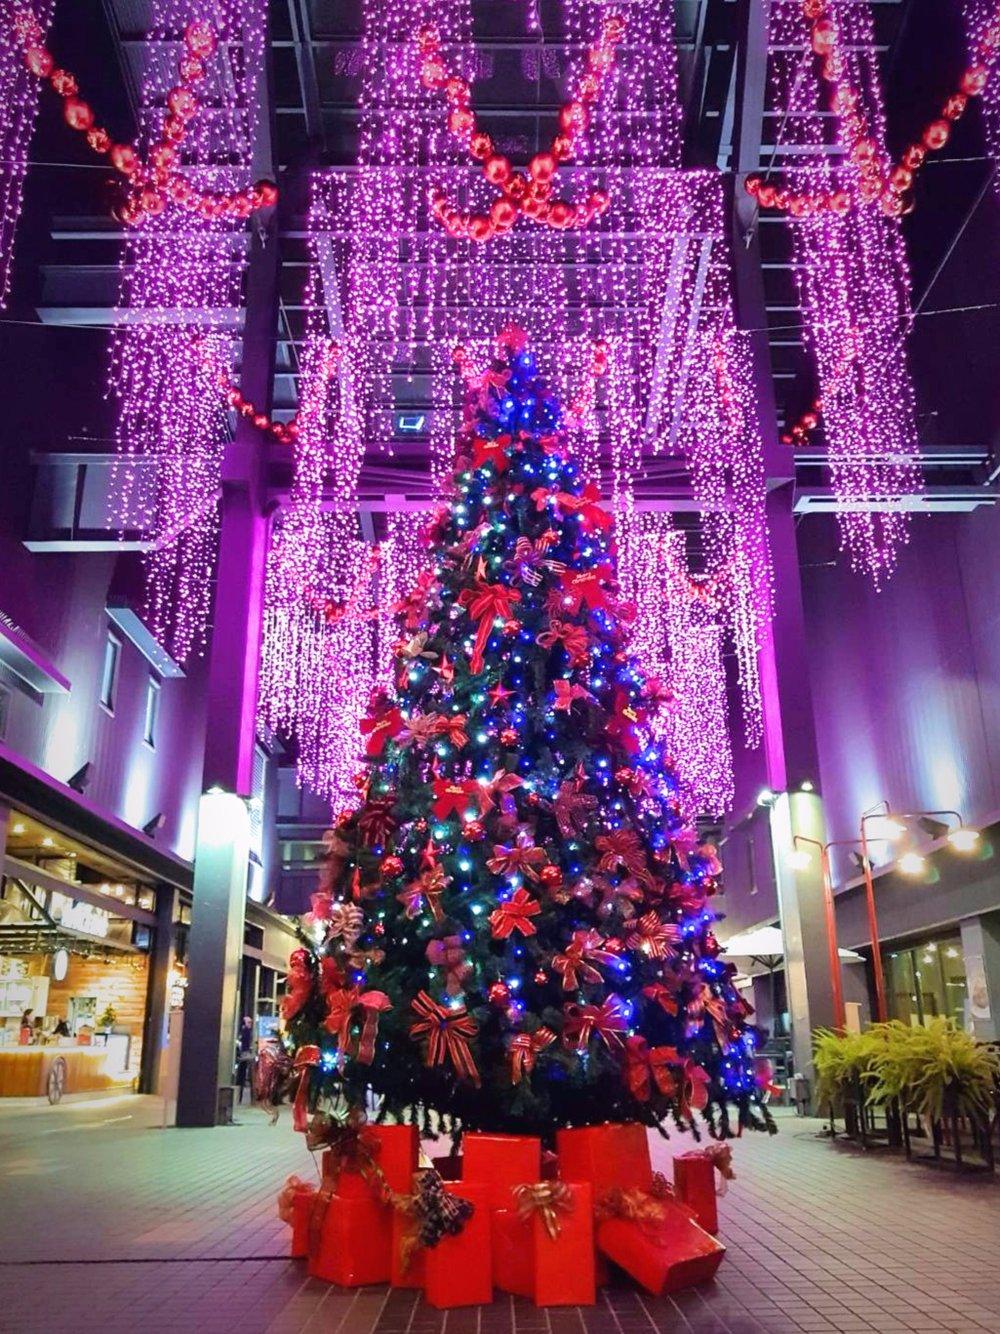 MLD台鋁 - MLD台鋁是每年聖誕必要的踩點之一,低調極簡的建築特色,完整的襯托出聖誕裝飾的閃耀, 別忘了 跟Uber聖誕大字合照,就在這個冬天讓你遇見最不一樣的MLD台鋁!地址:806高雄市前鎮區忠勤路8號日期:2017/12/01 - 2018/01/01時間:一至四11:30-21:30 五11:30-22:00 六日及國定假日10:00-22:00